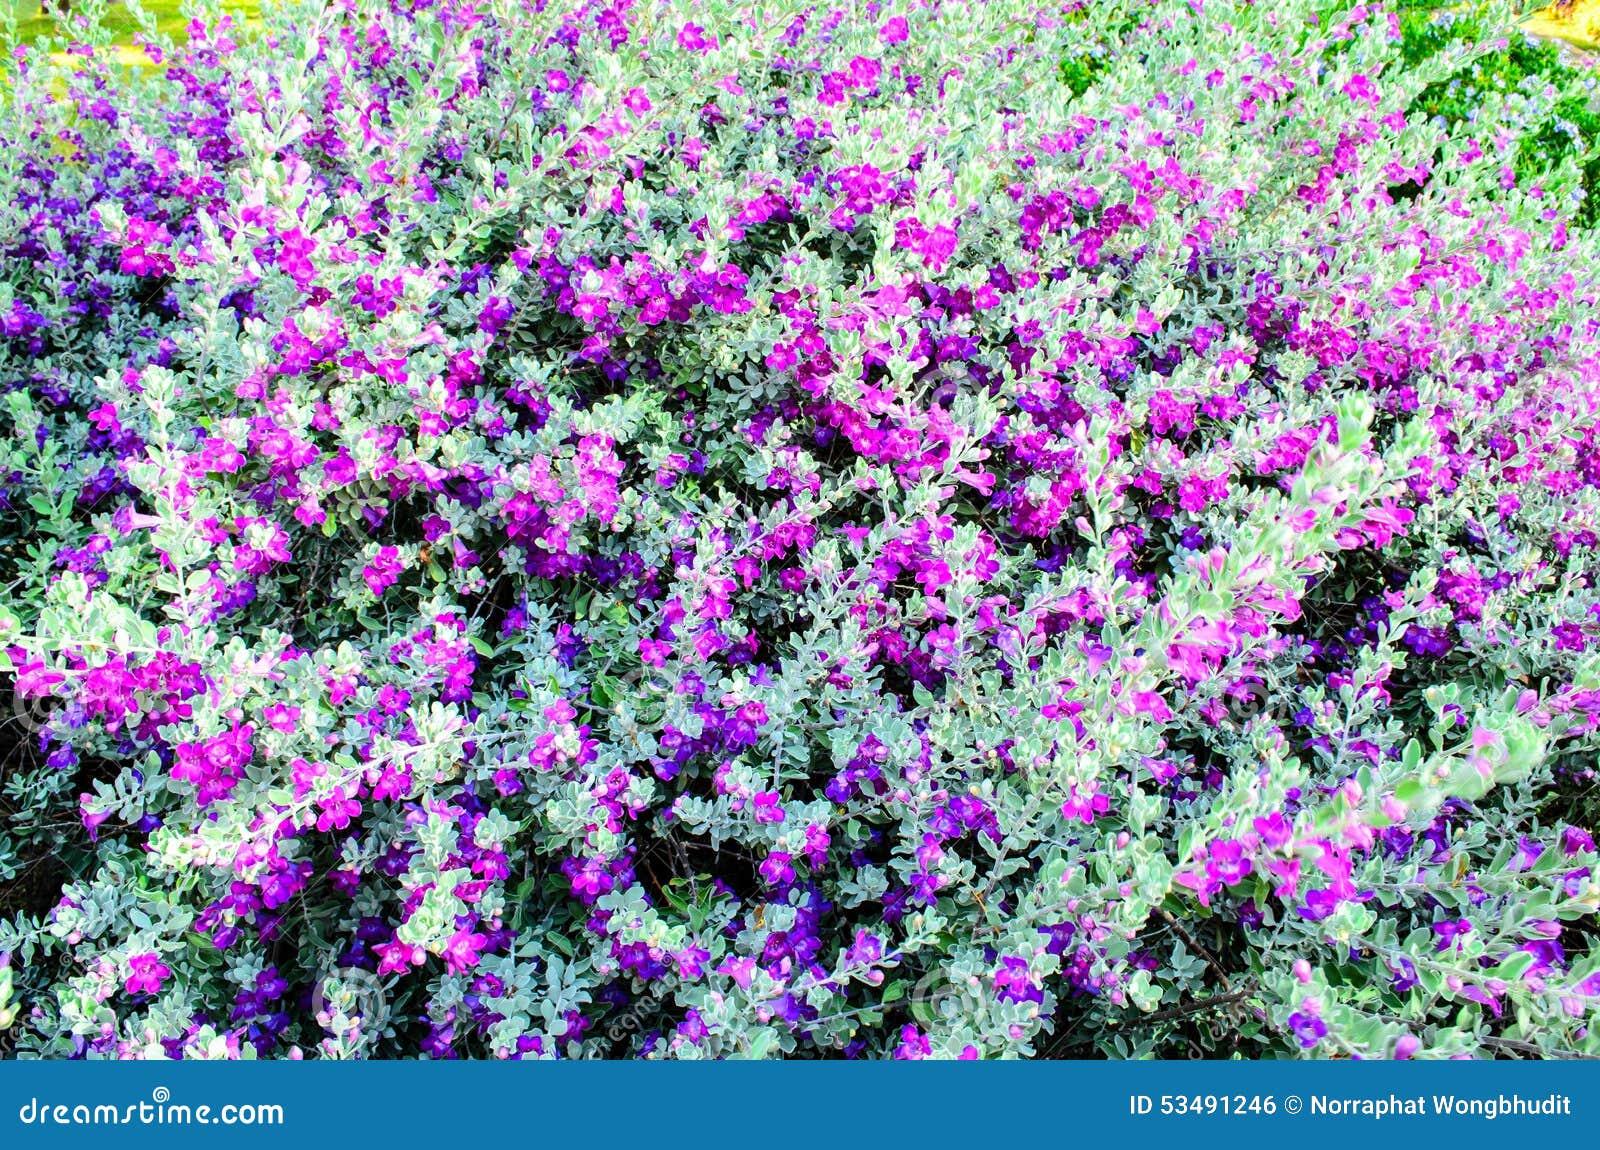 Purple Flowering Bush Stock Photo Image Of Nature Evergreen 53491246